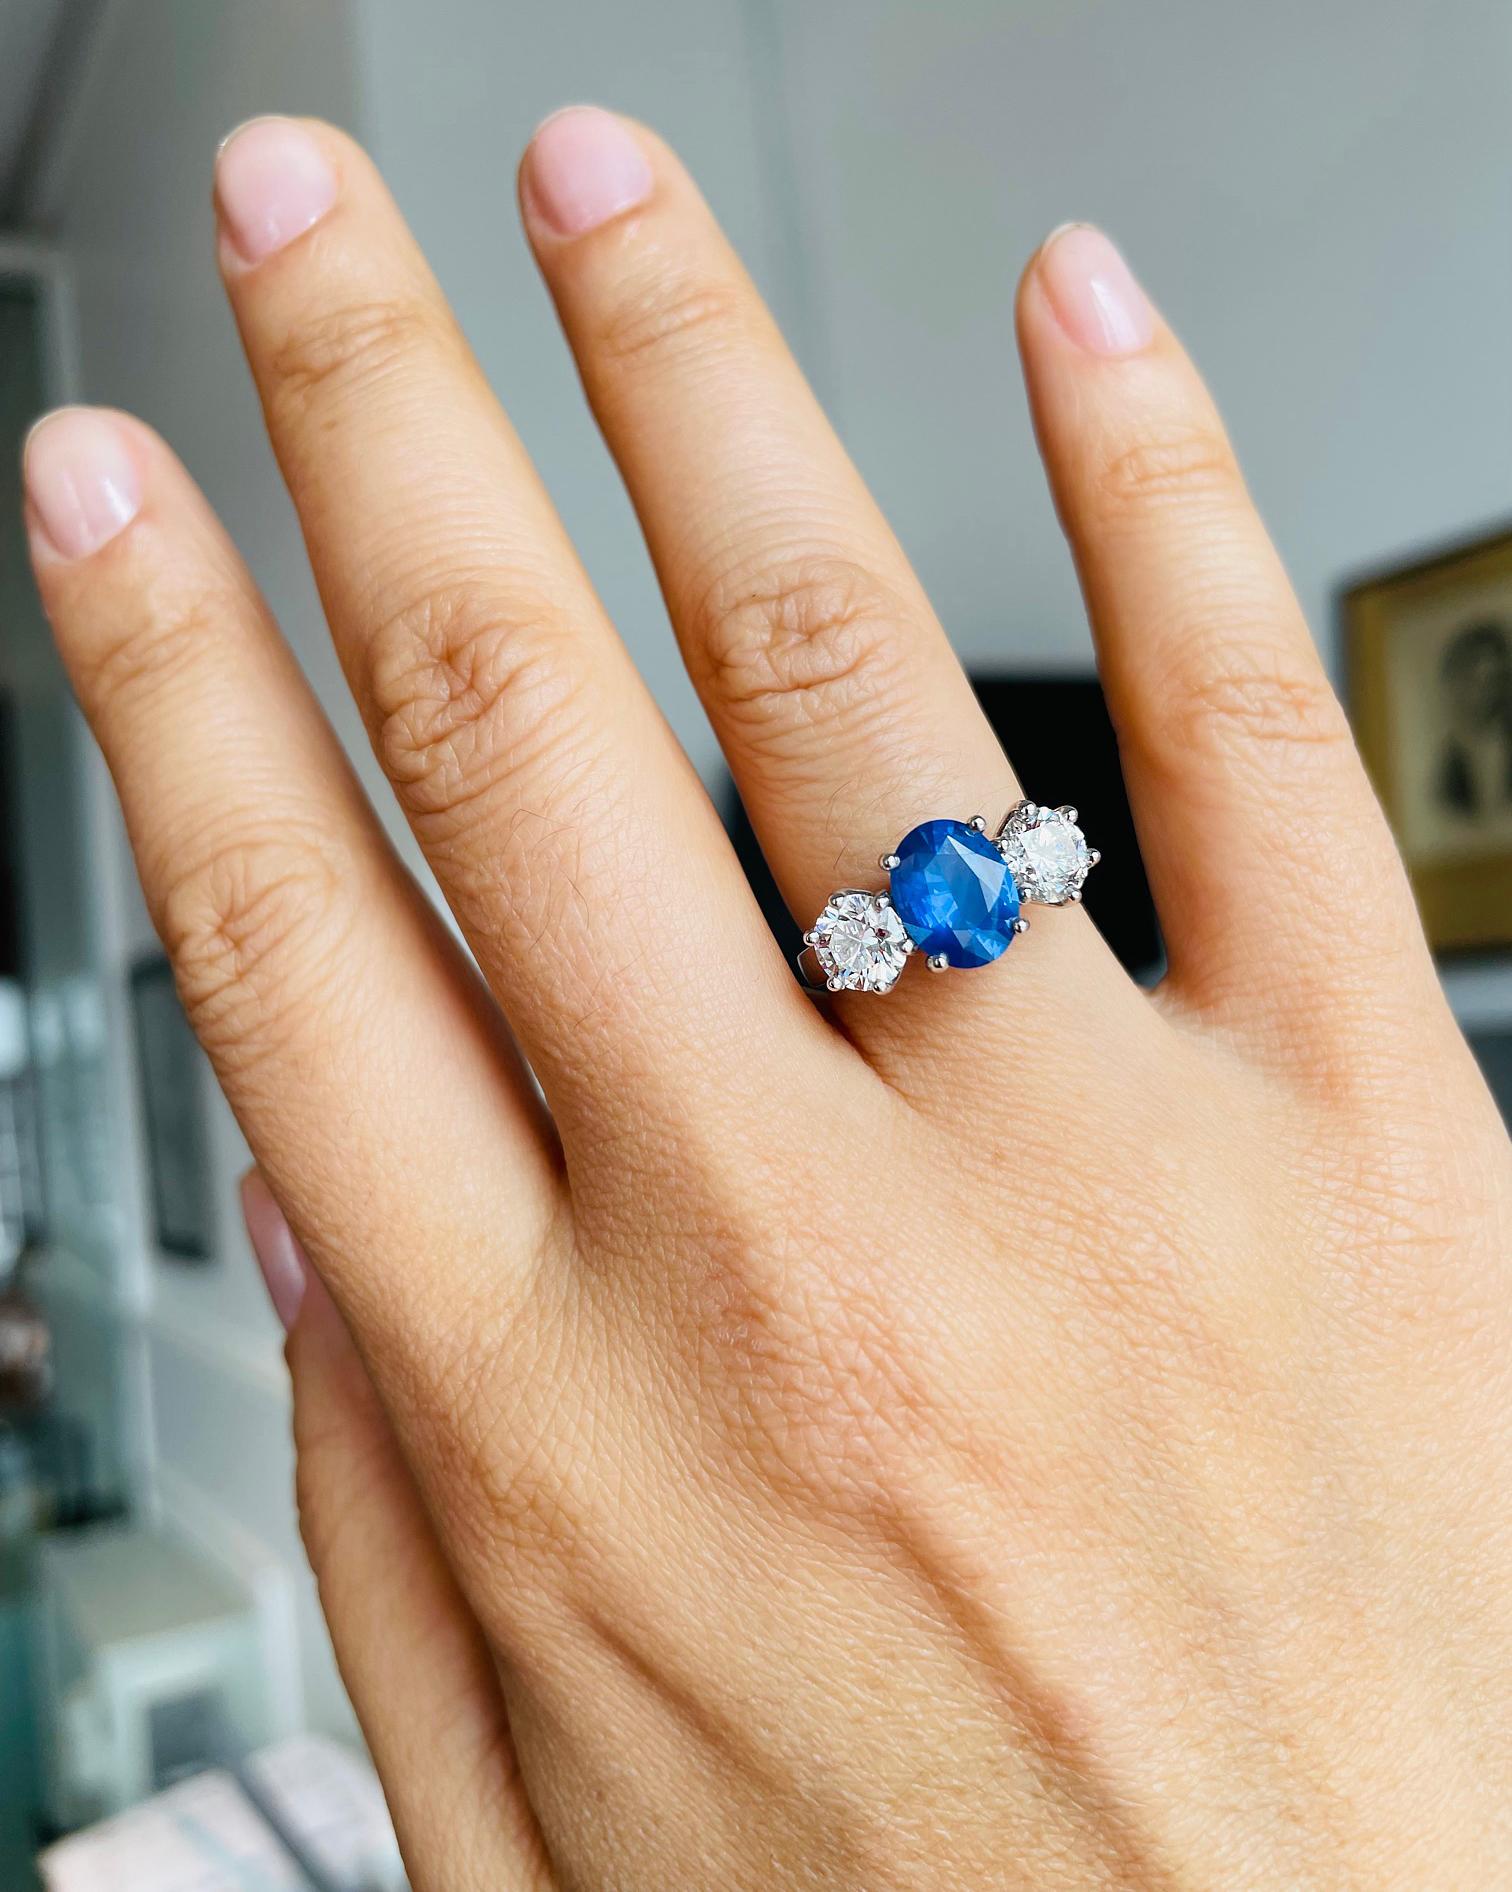 18k White Gold 3 Stone Oval Sapphire & Brilliant Cut Diamond Ring